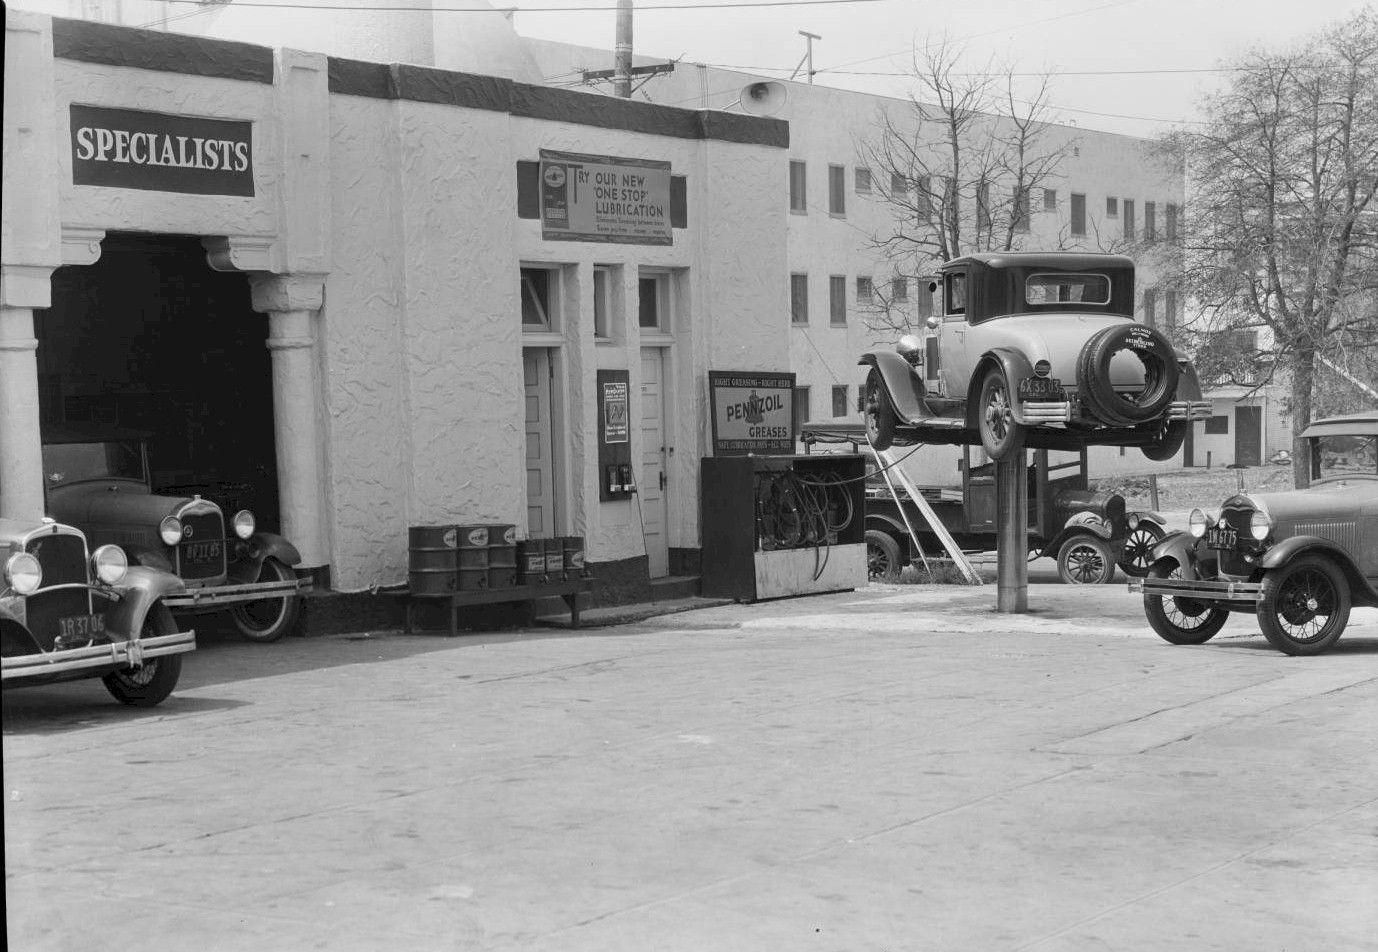 Cars & grease rack at service station, 4982 Hollywood Blvd